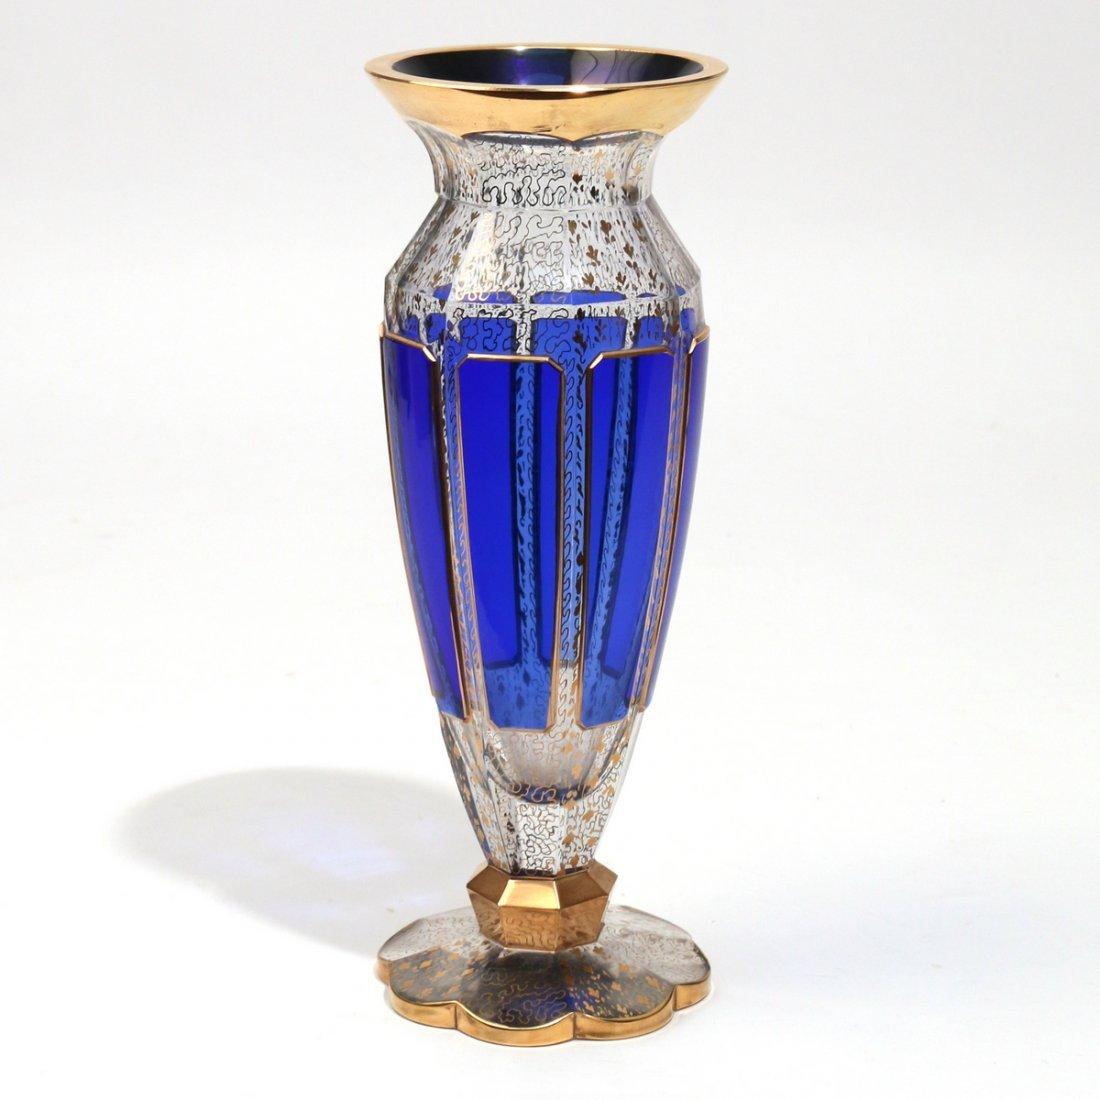 MOSER COBALT BLUE & GILT GLASS VASE